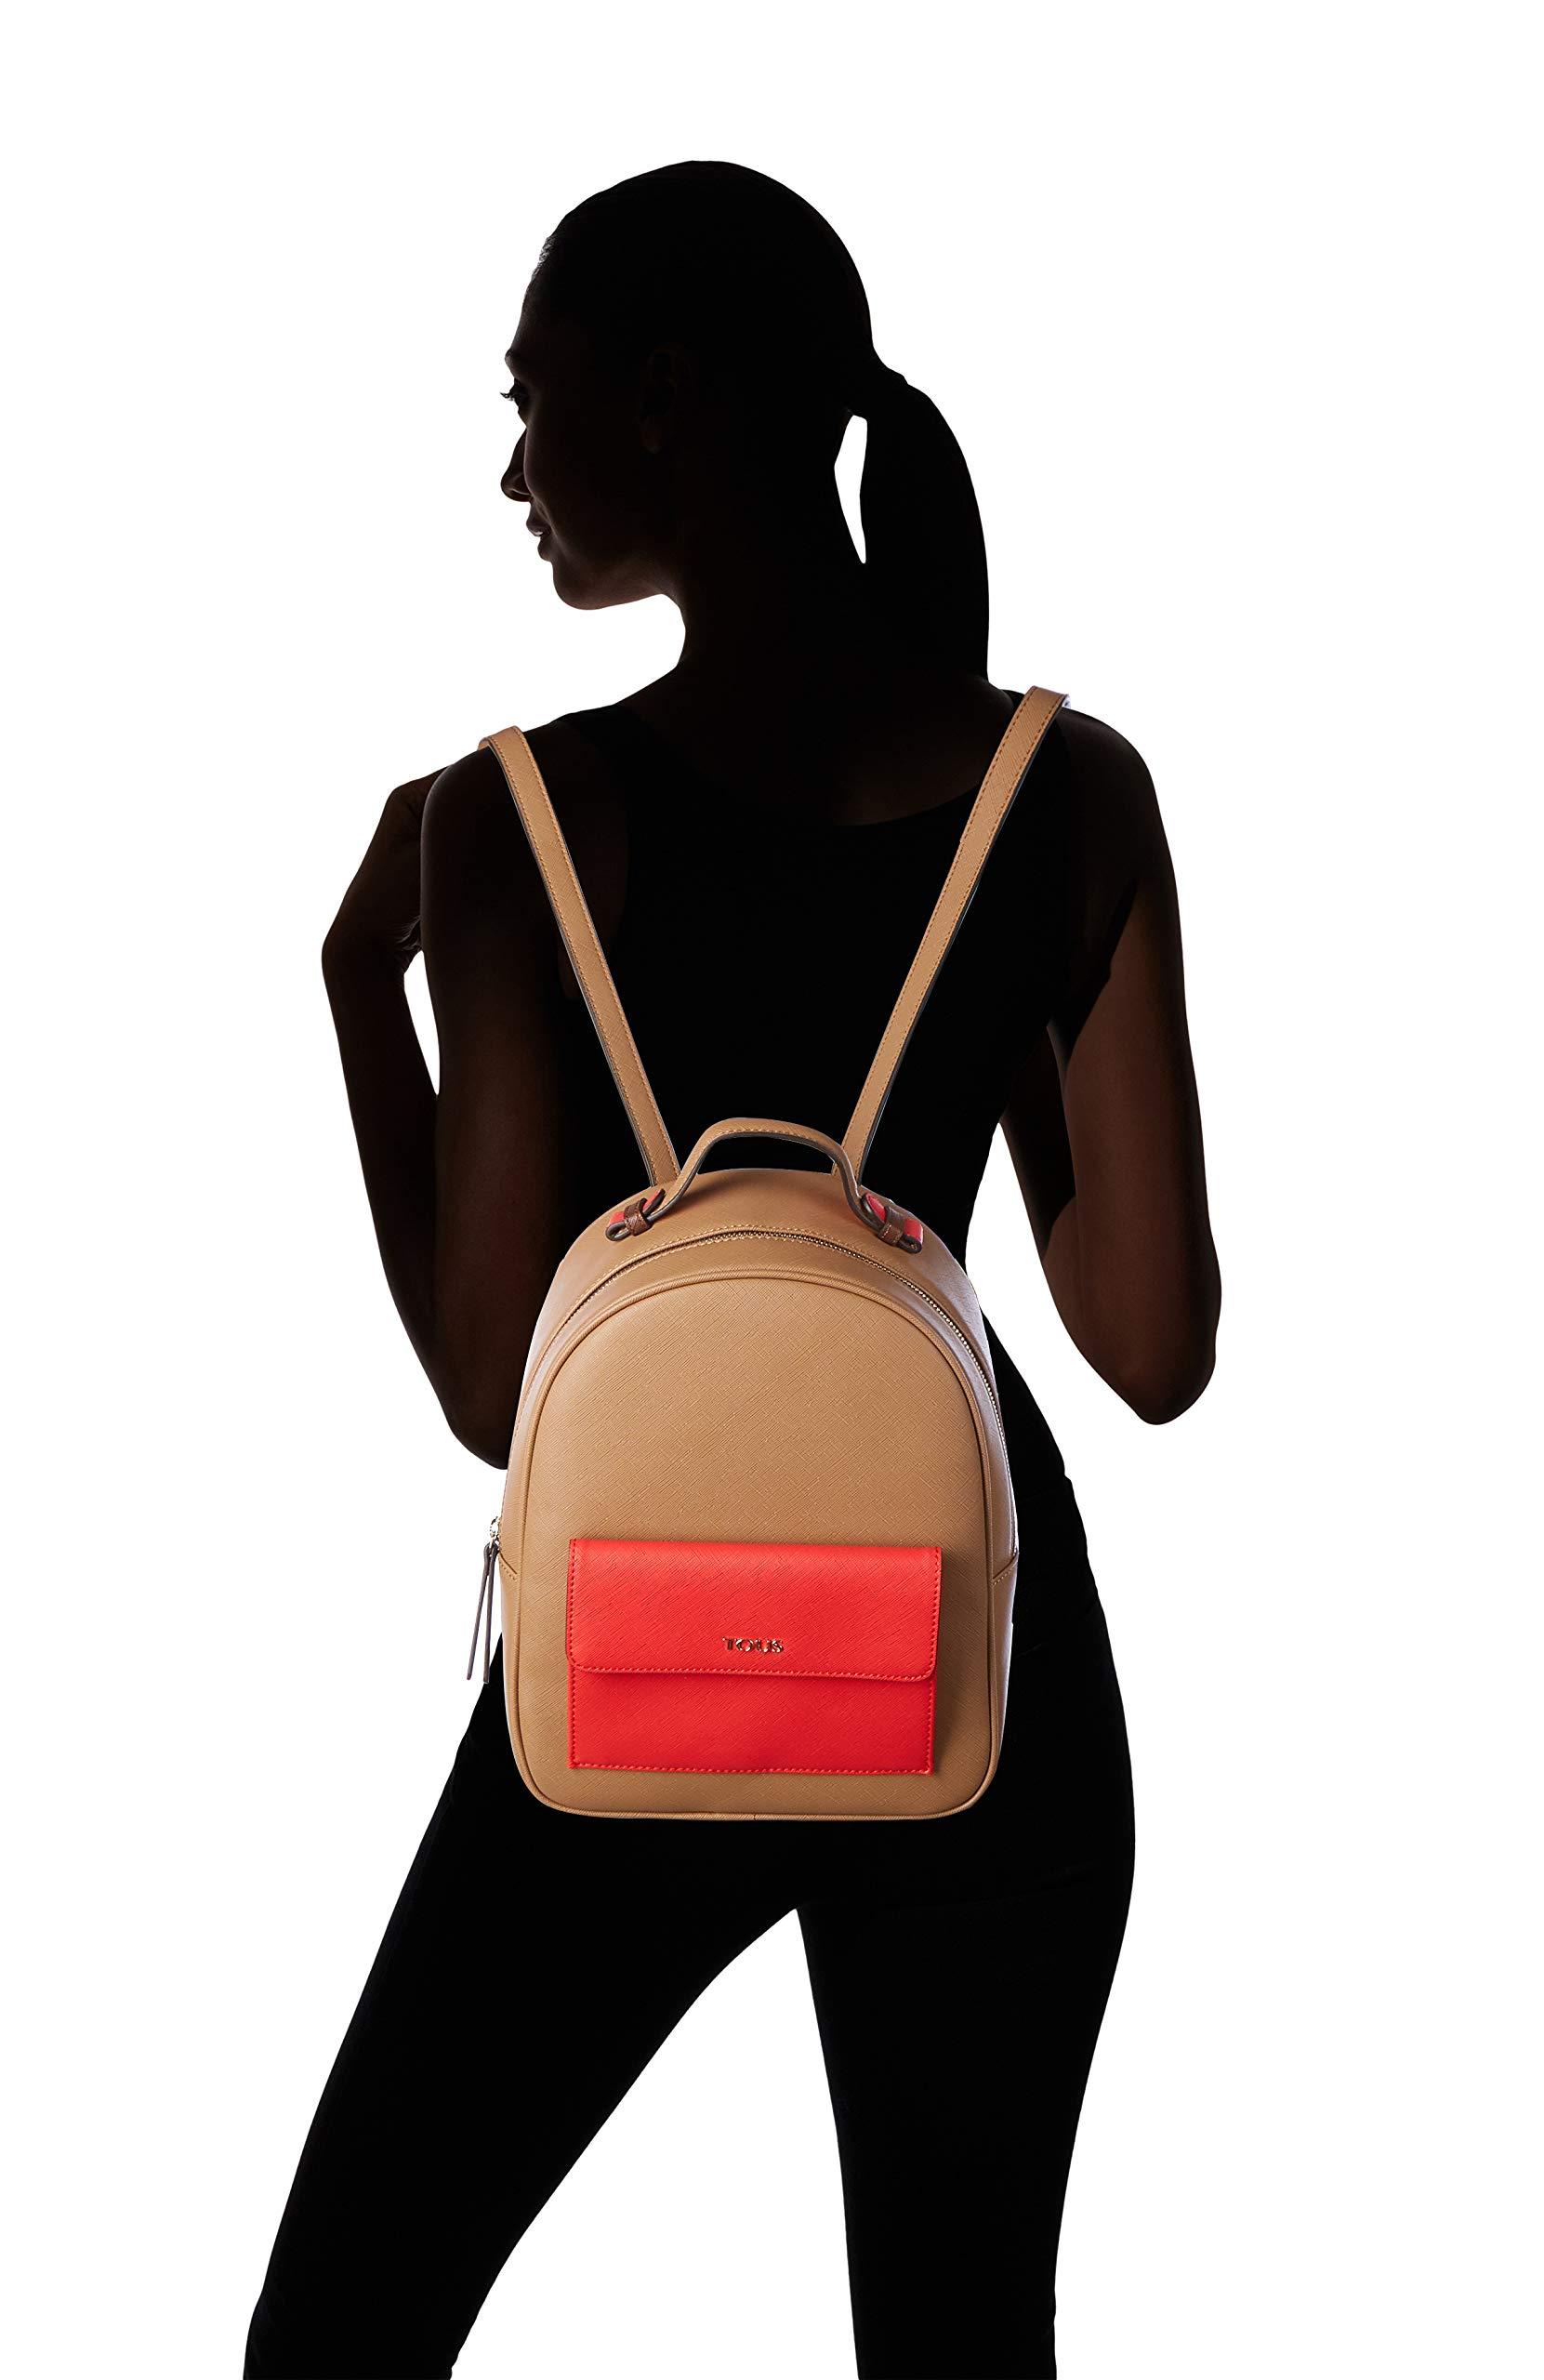 711ib7aKsuL - Tous Mochila Essence MARRÓN-Rojo, Bolso Mujer, 25x31x12 cm (W x H x L)